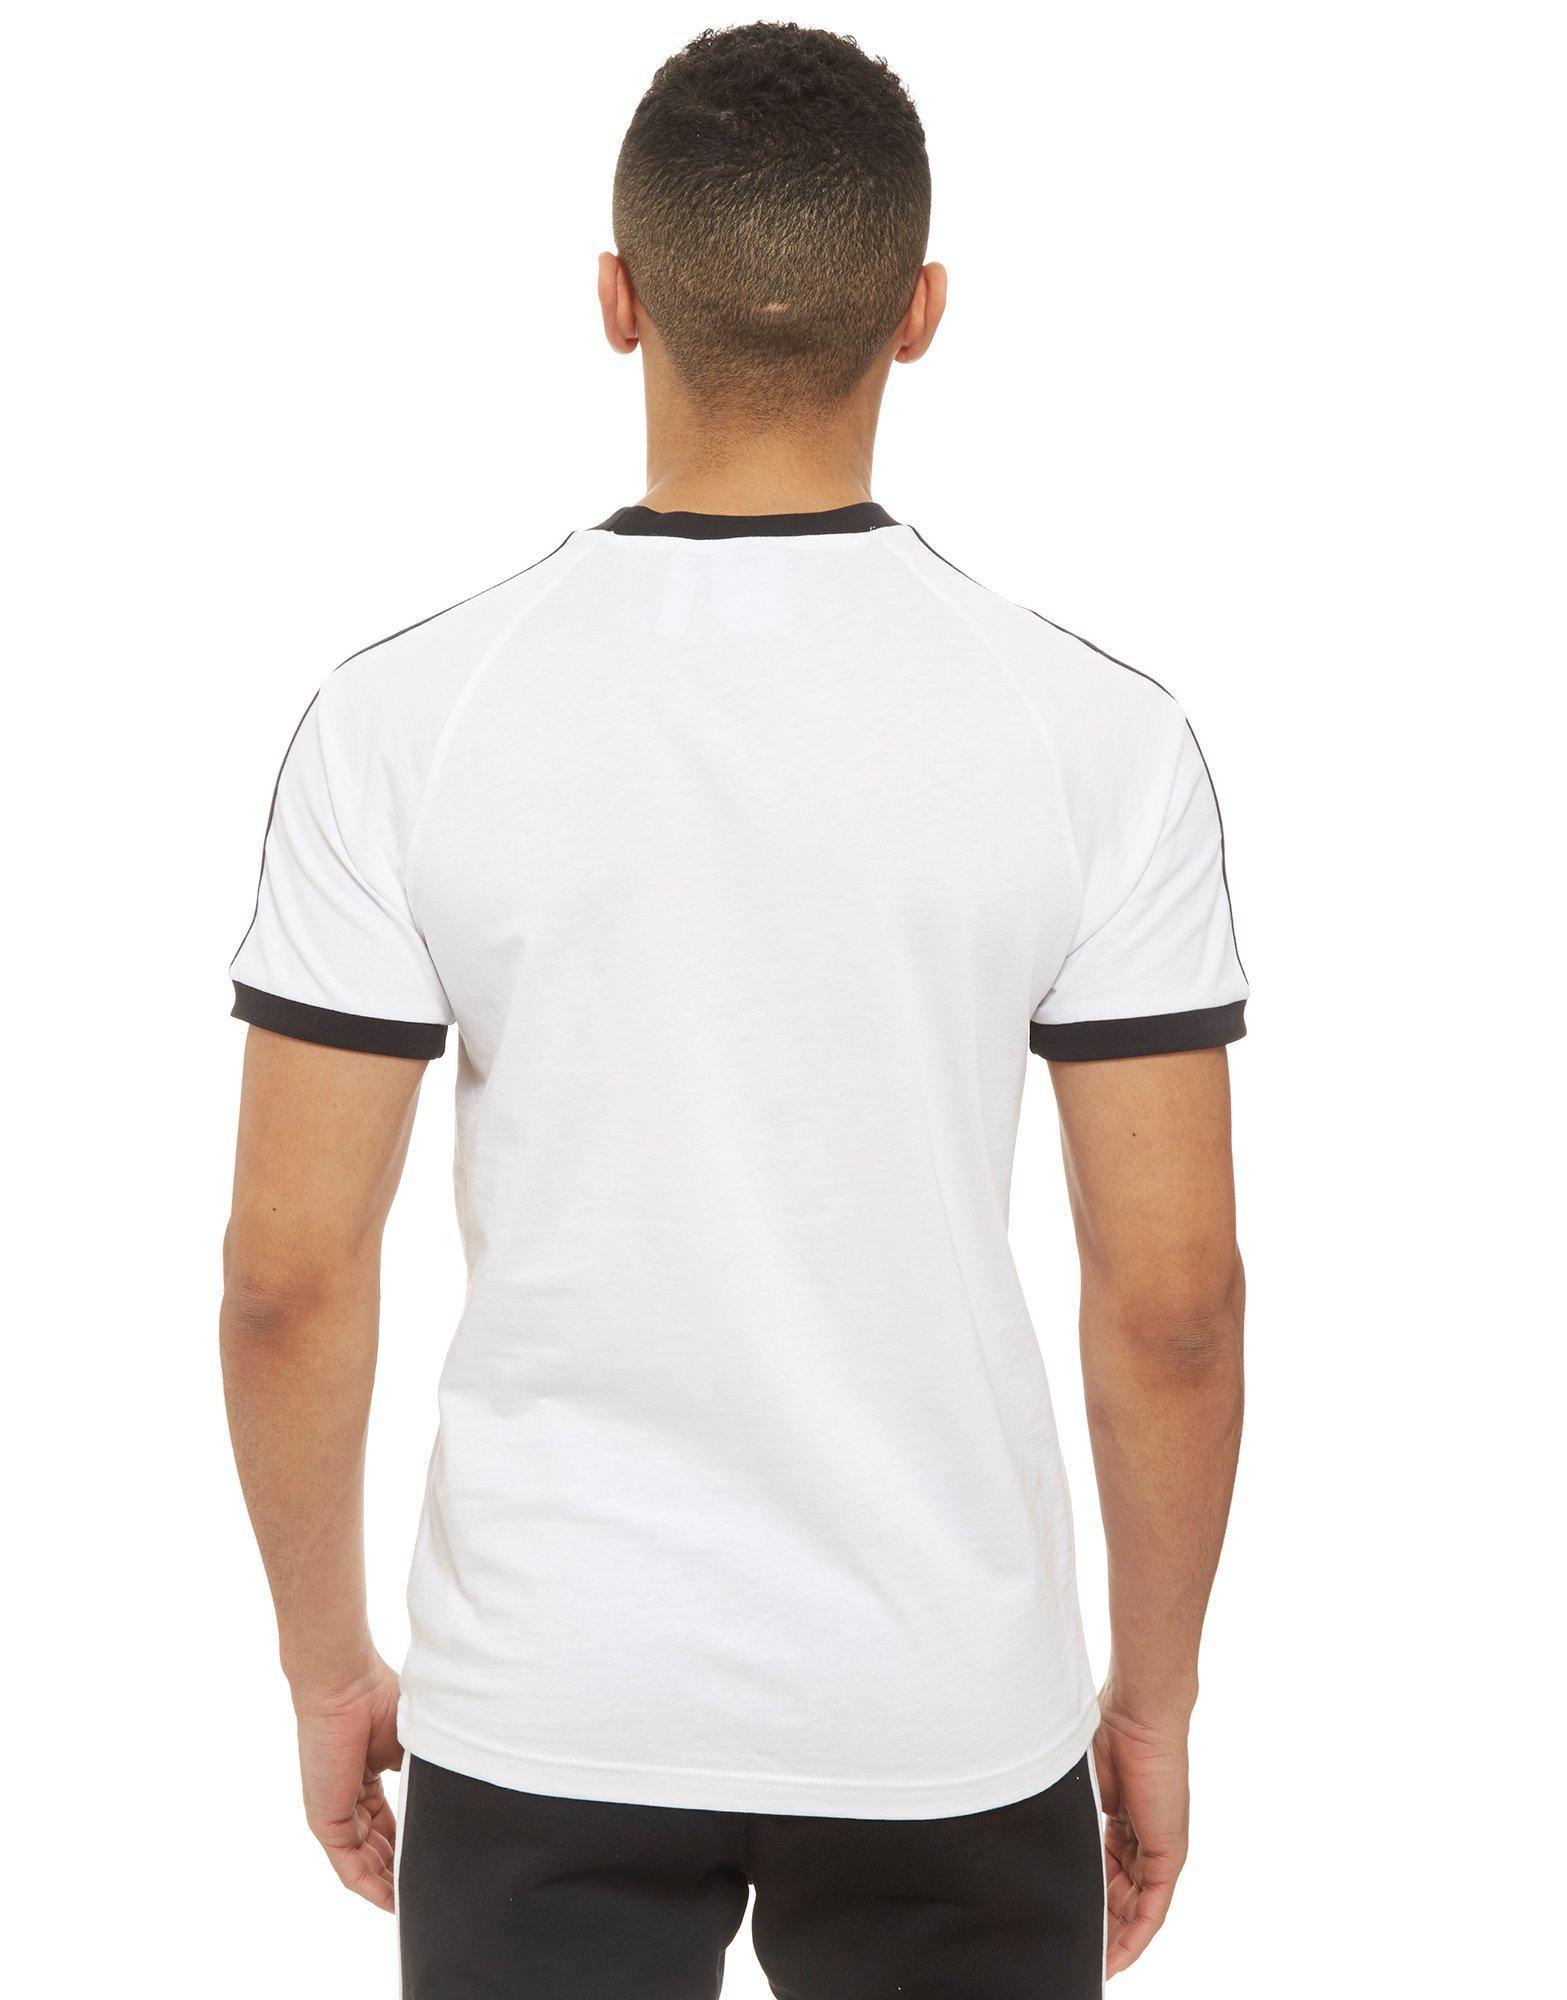 72e95ab2 adidas Originals California T-shirt Az8128 in White for Men - Lyst